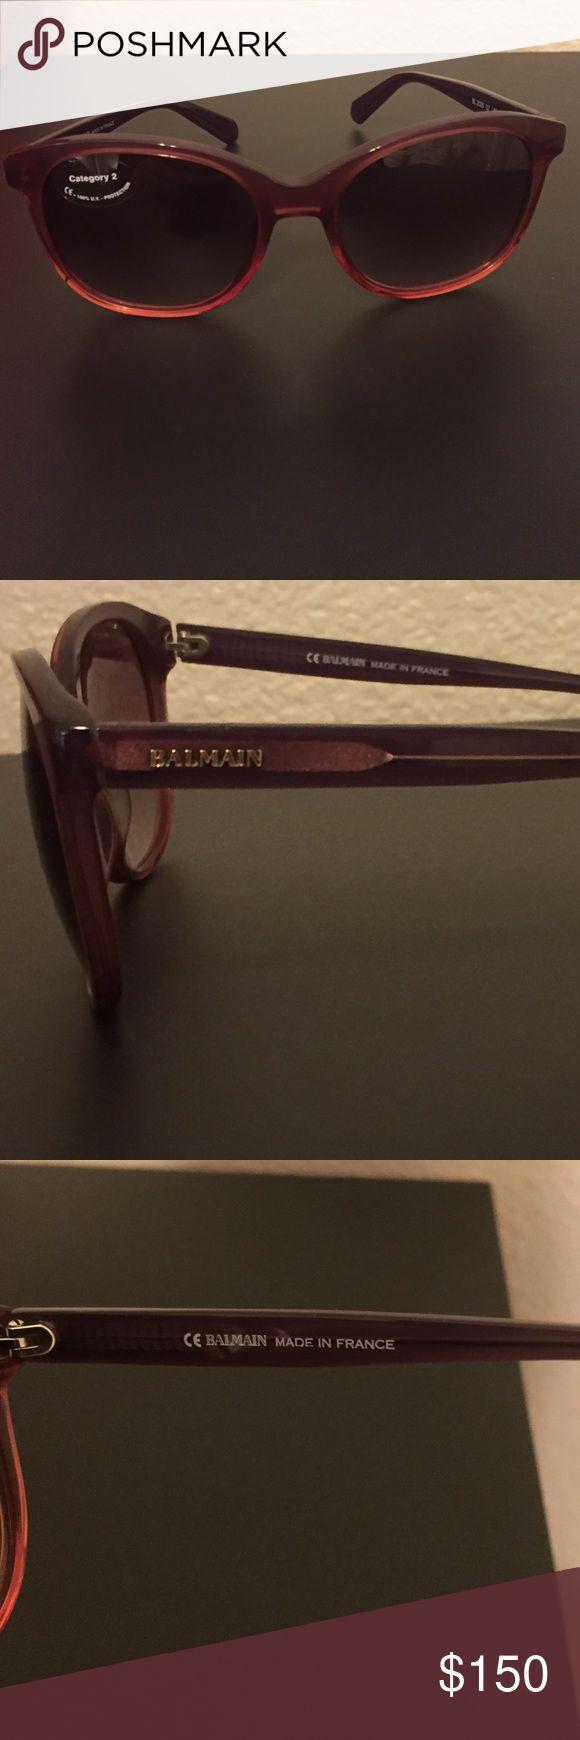 BRAND NEW! BALMAIN plum rectangle sunglasses! 100% AUTHENTIC! BALMAIN plum rectangle women's style sunglasses w/ brown lenses. Logo on both sides. Made in France! Balmain Accessories Sunglasses